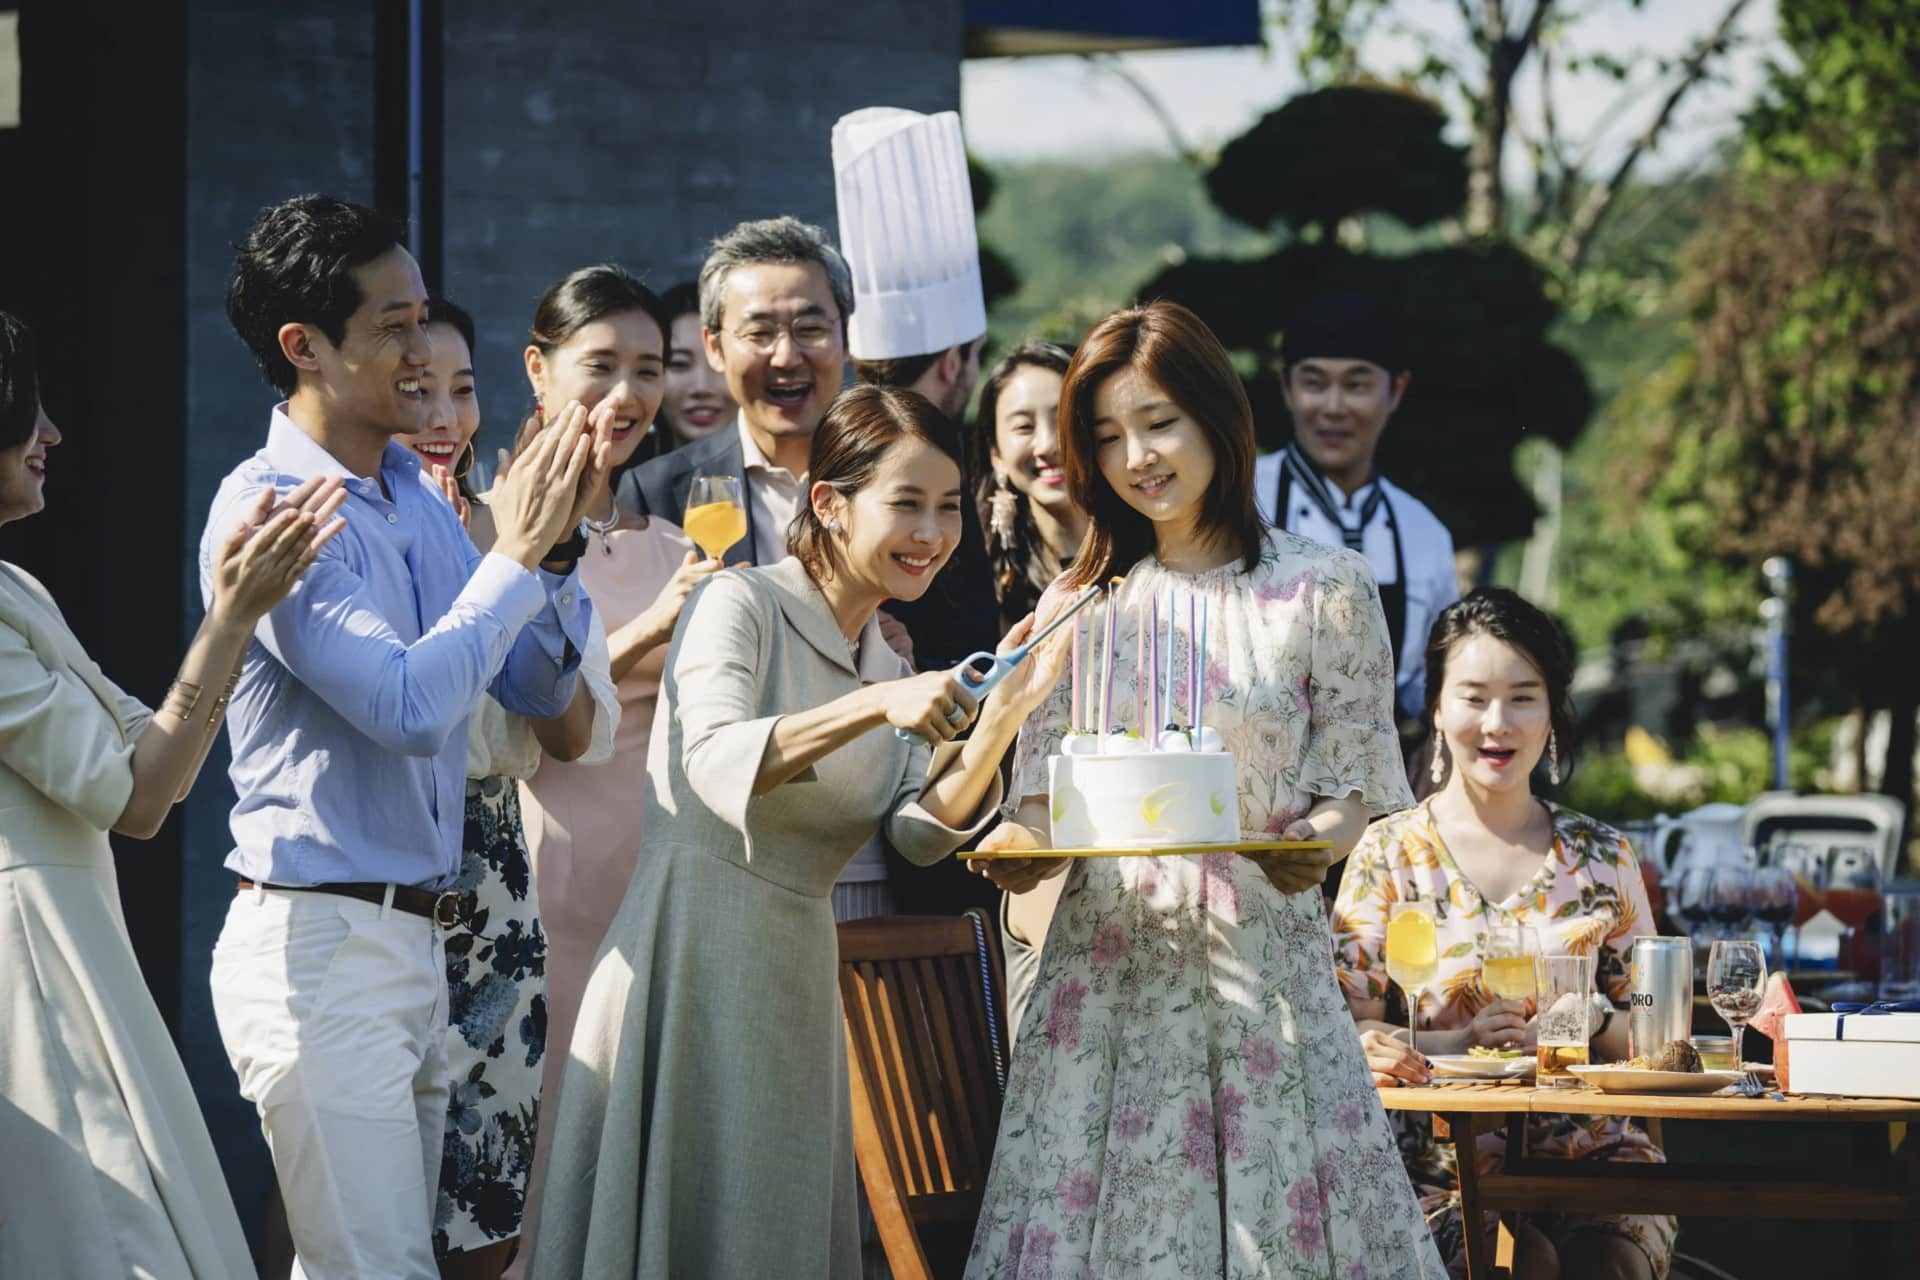 Parasite is an infectious class act Bong Joon-ho South Korea film